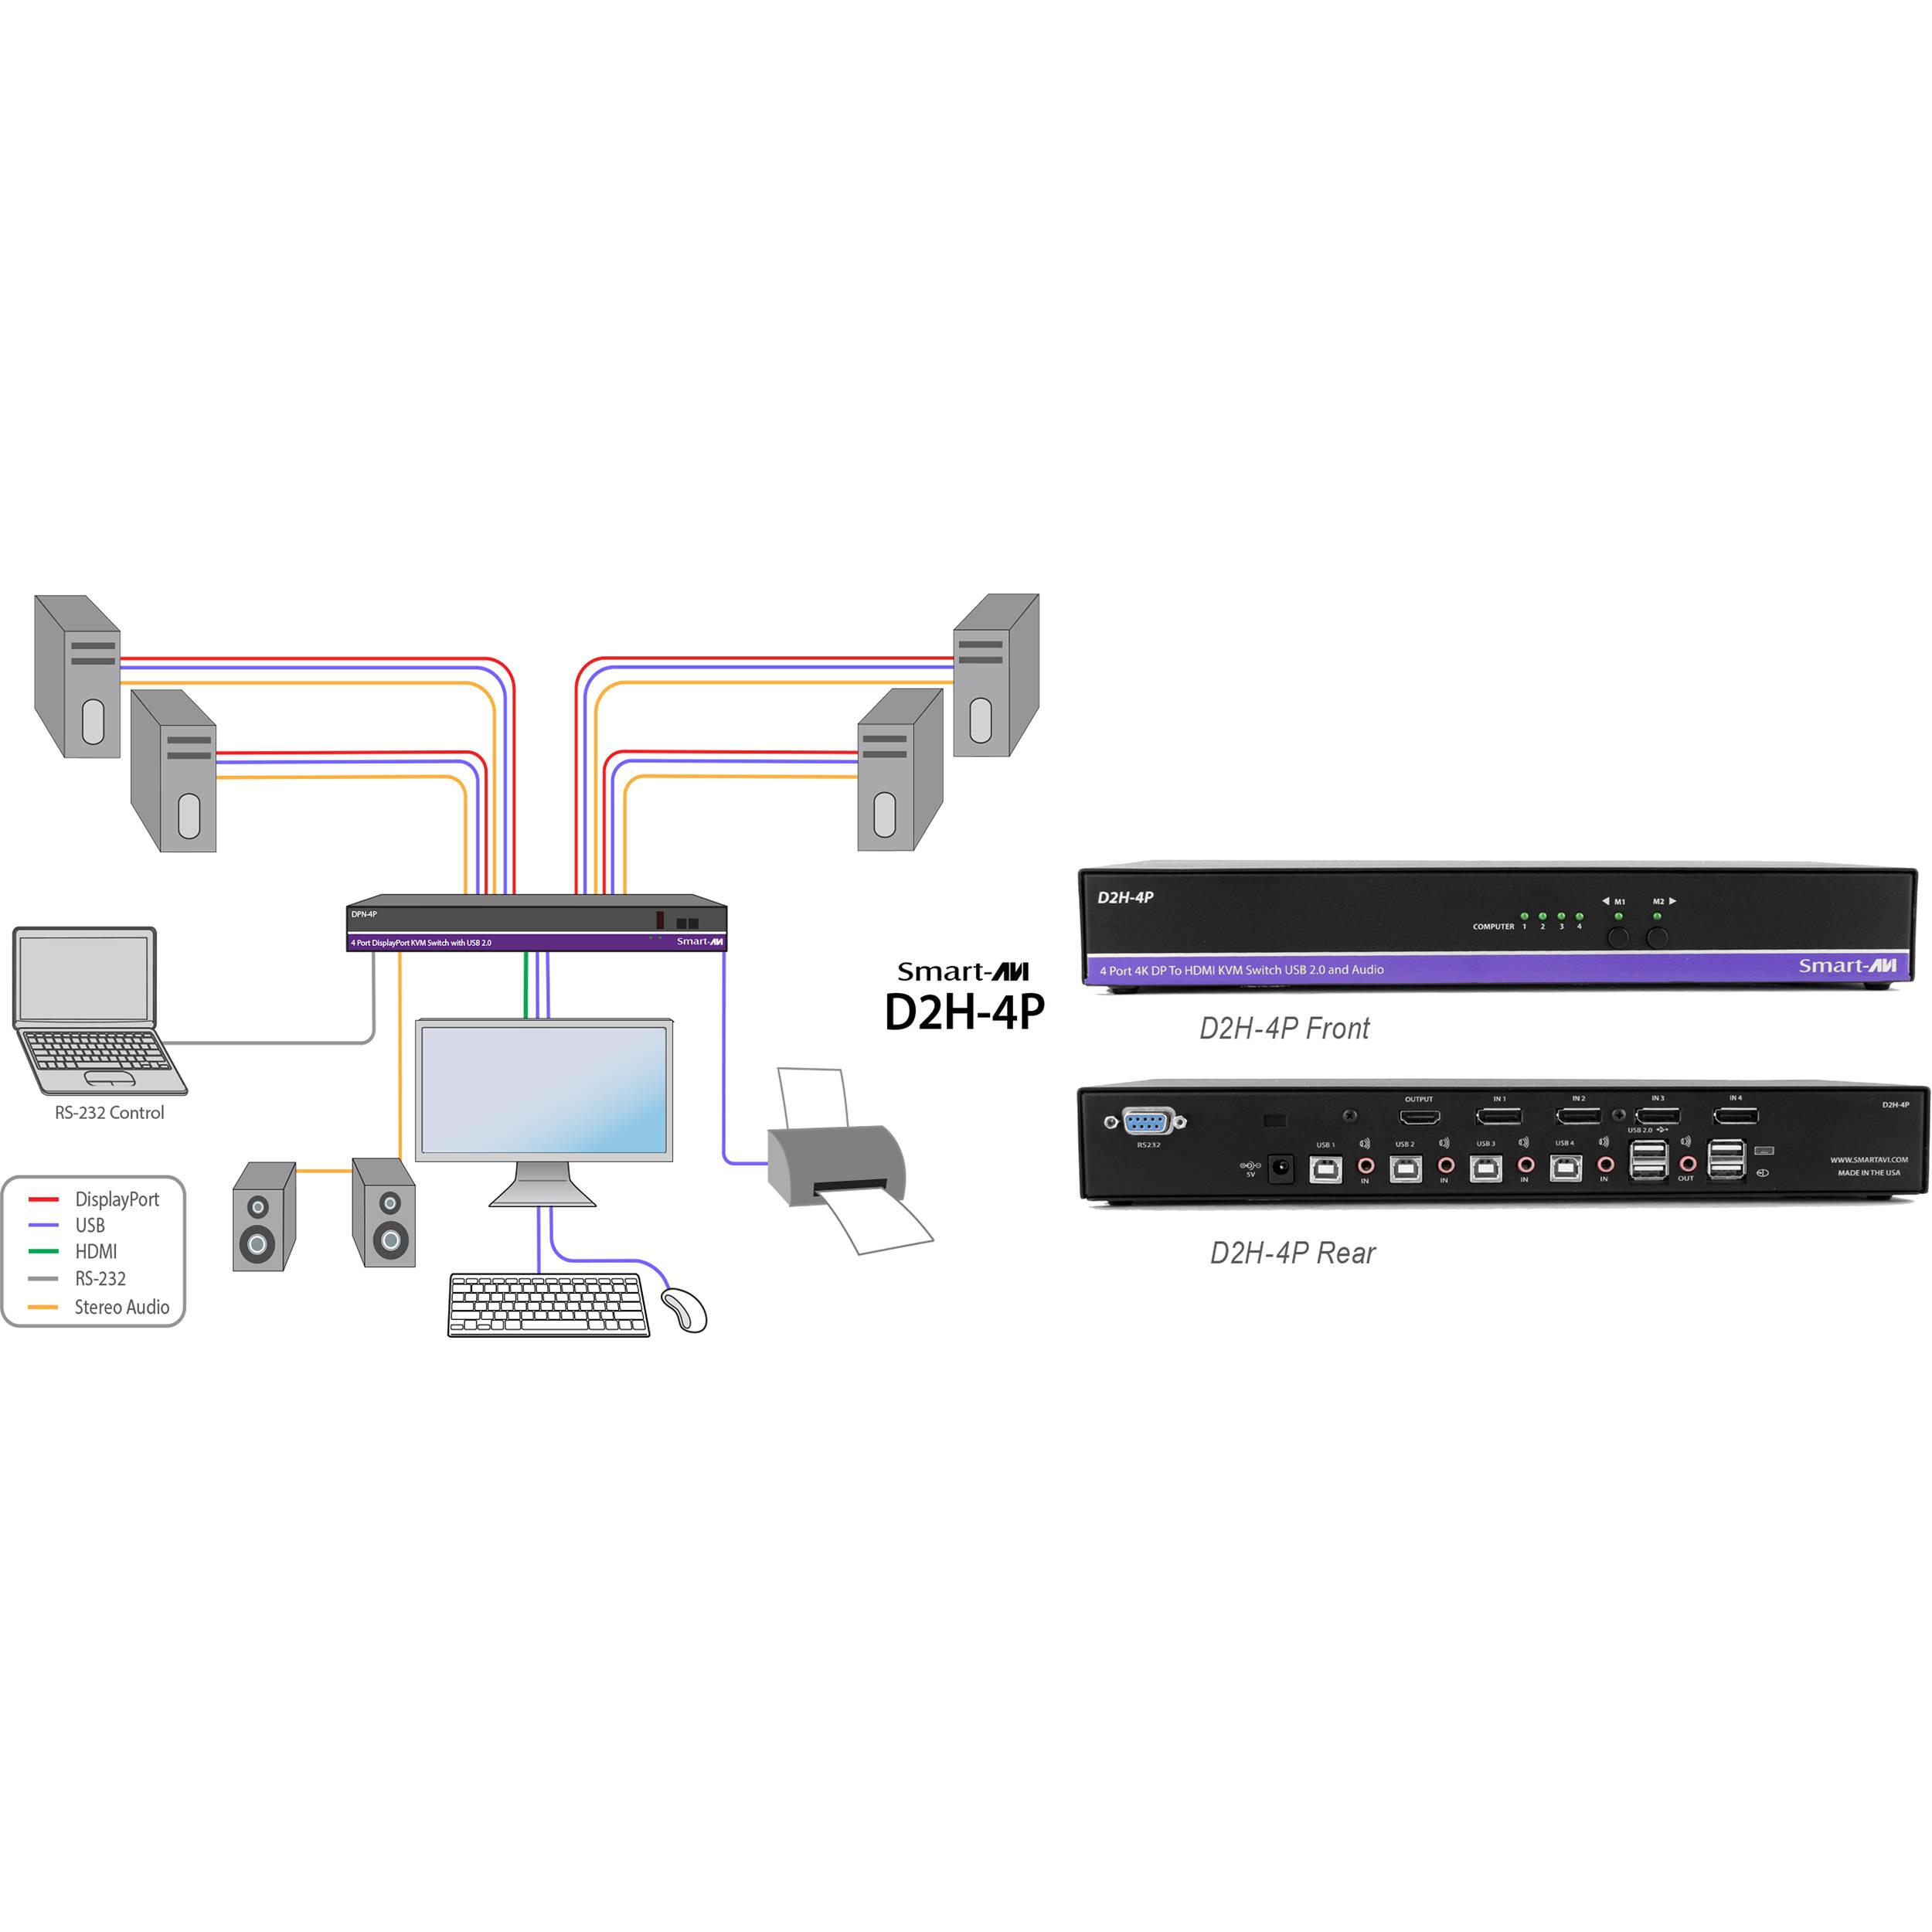 Smart-AVI 4-Port DisplayPort-to-HDMI KVM Switch with USB 2 0 Hub